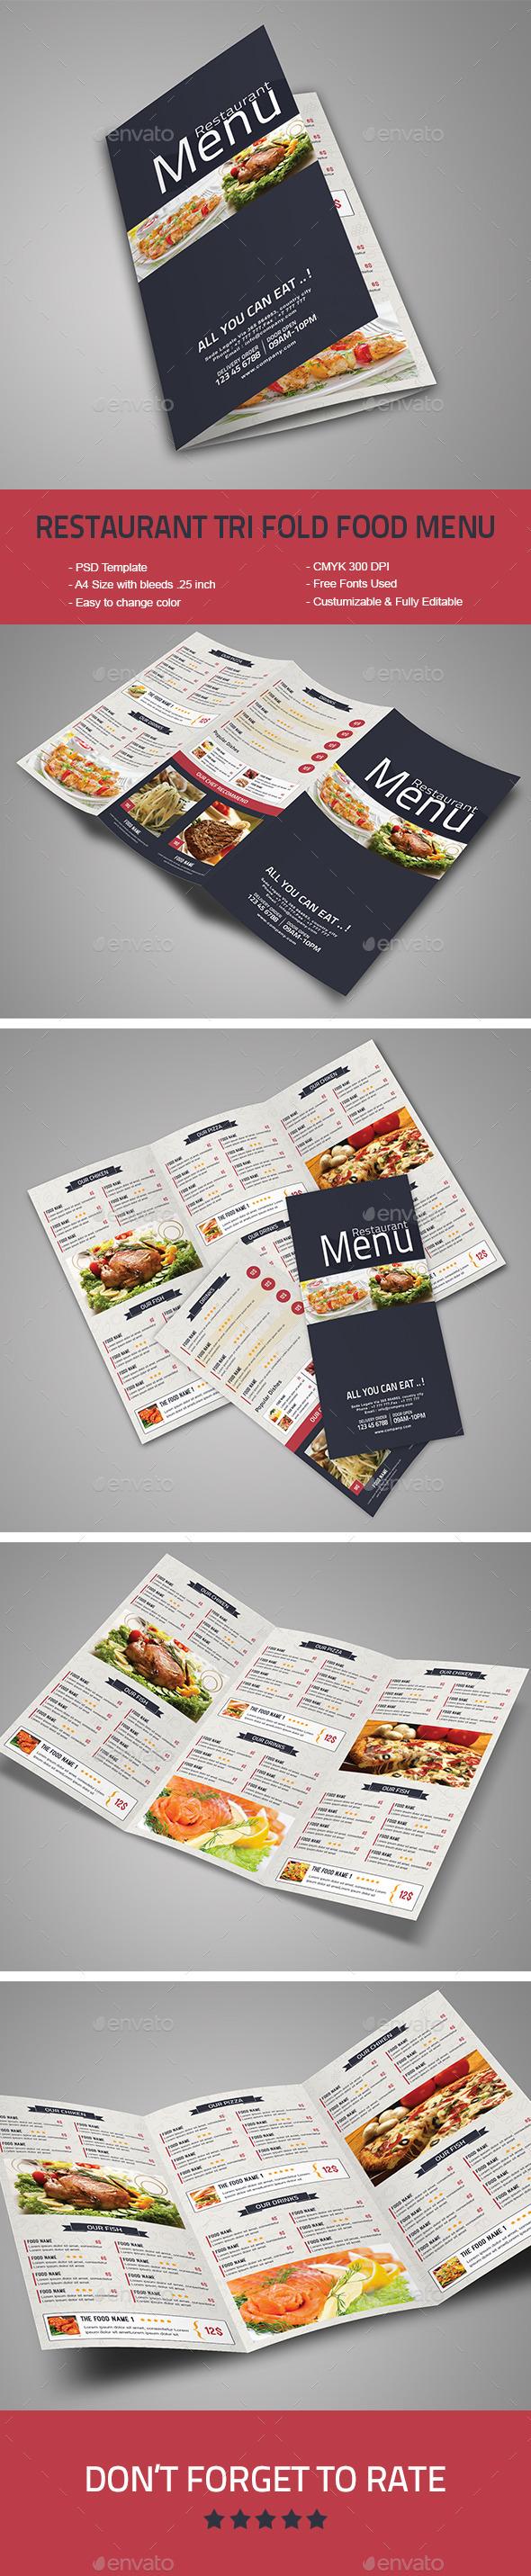 Restaurant Tri-Fold Food Menu - Food Menus Print Templates